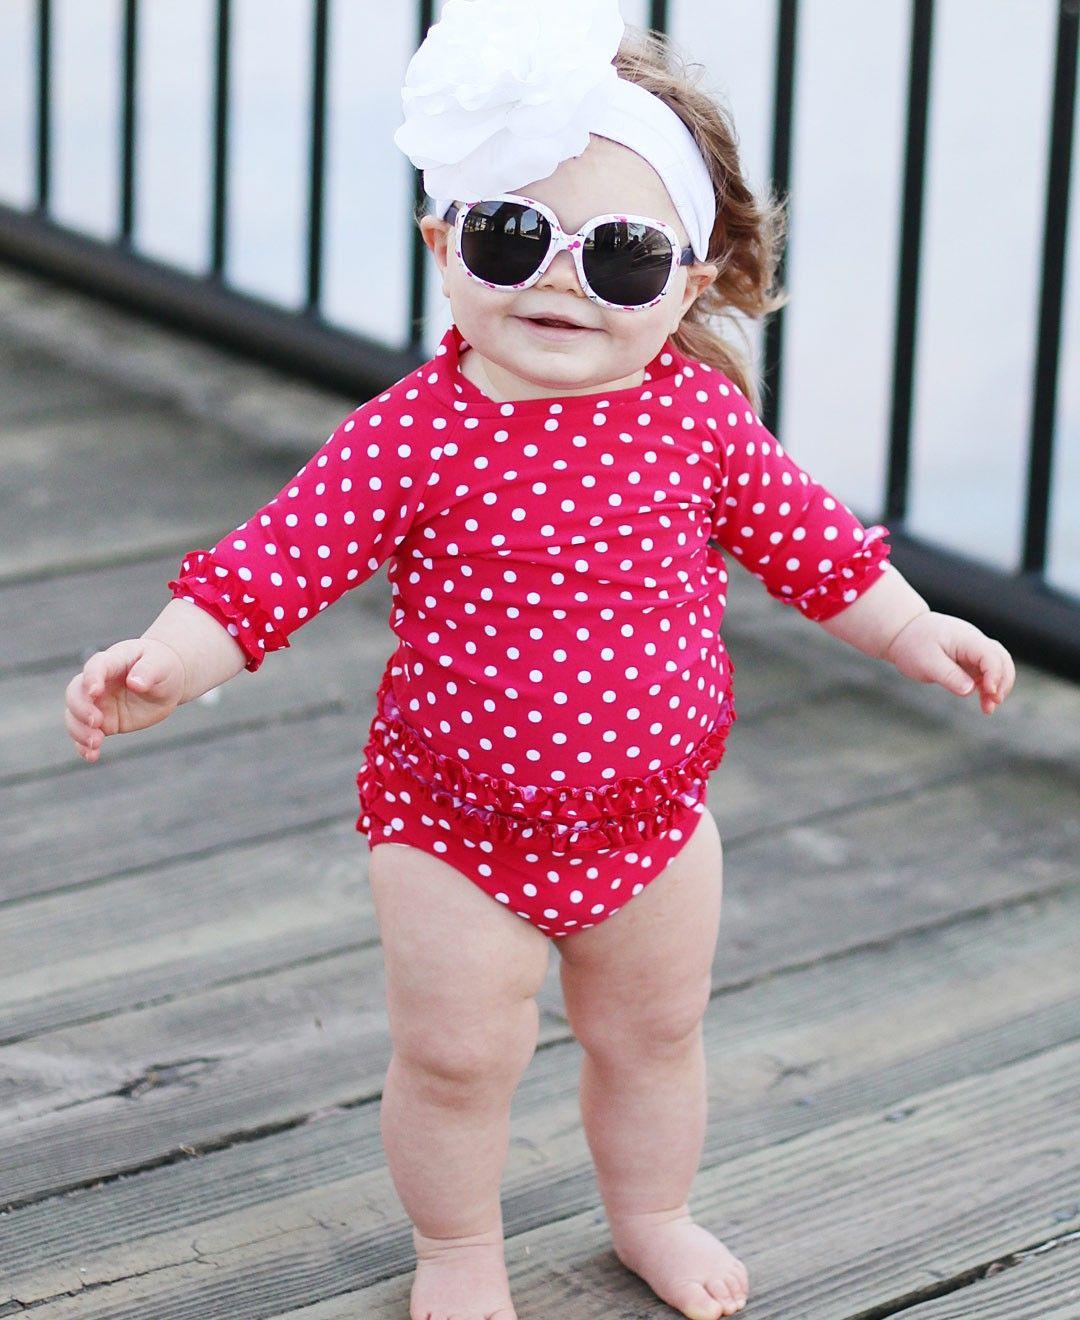 5b9d0a65e7016 Red Polka Dot Ruffled Rash Guard Bikini | Little Things For Wren ...